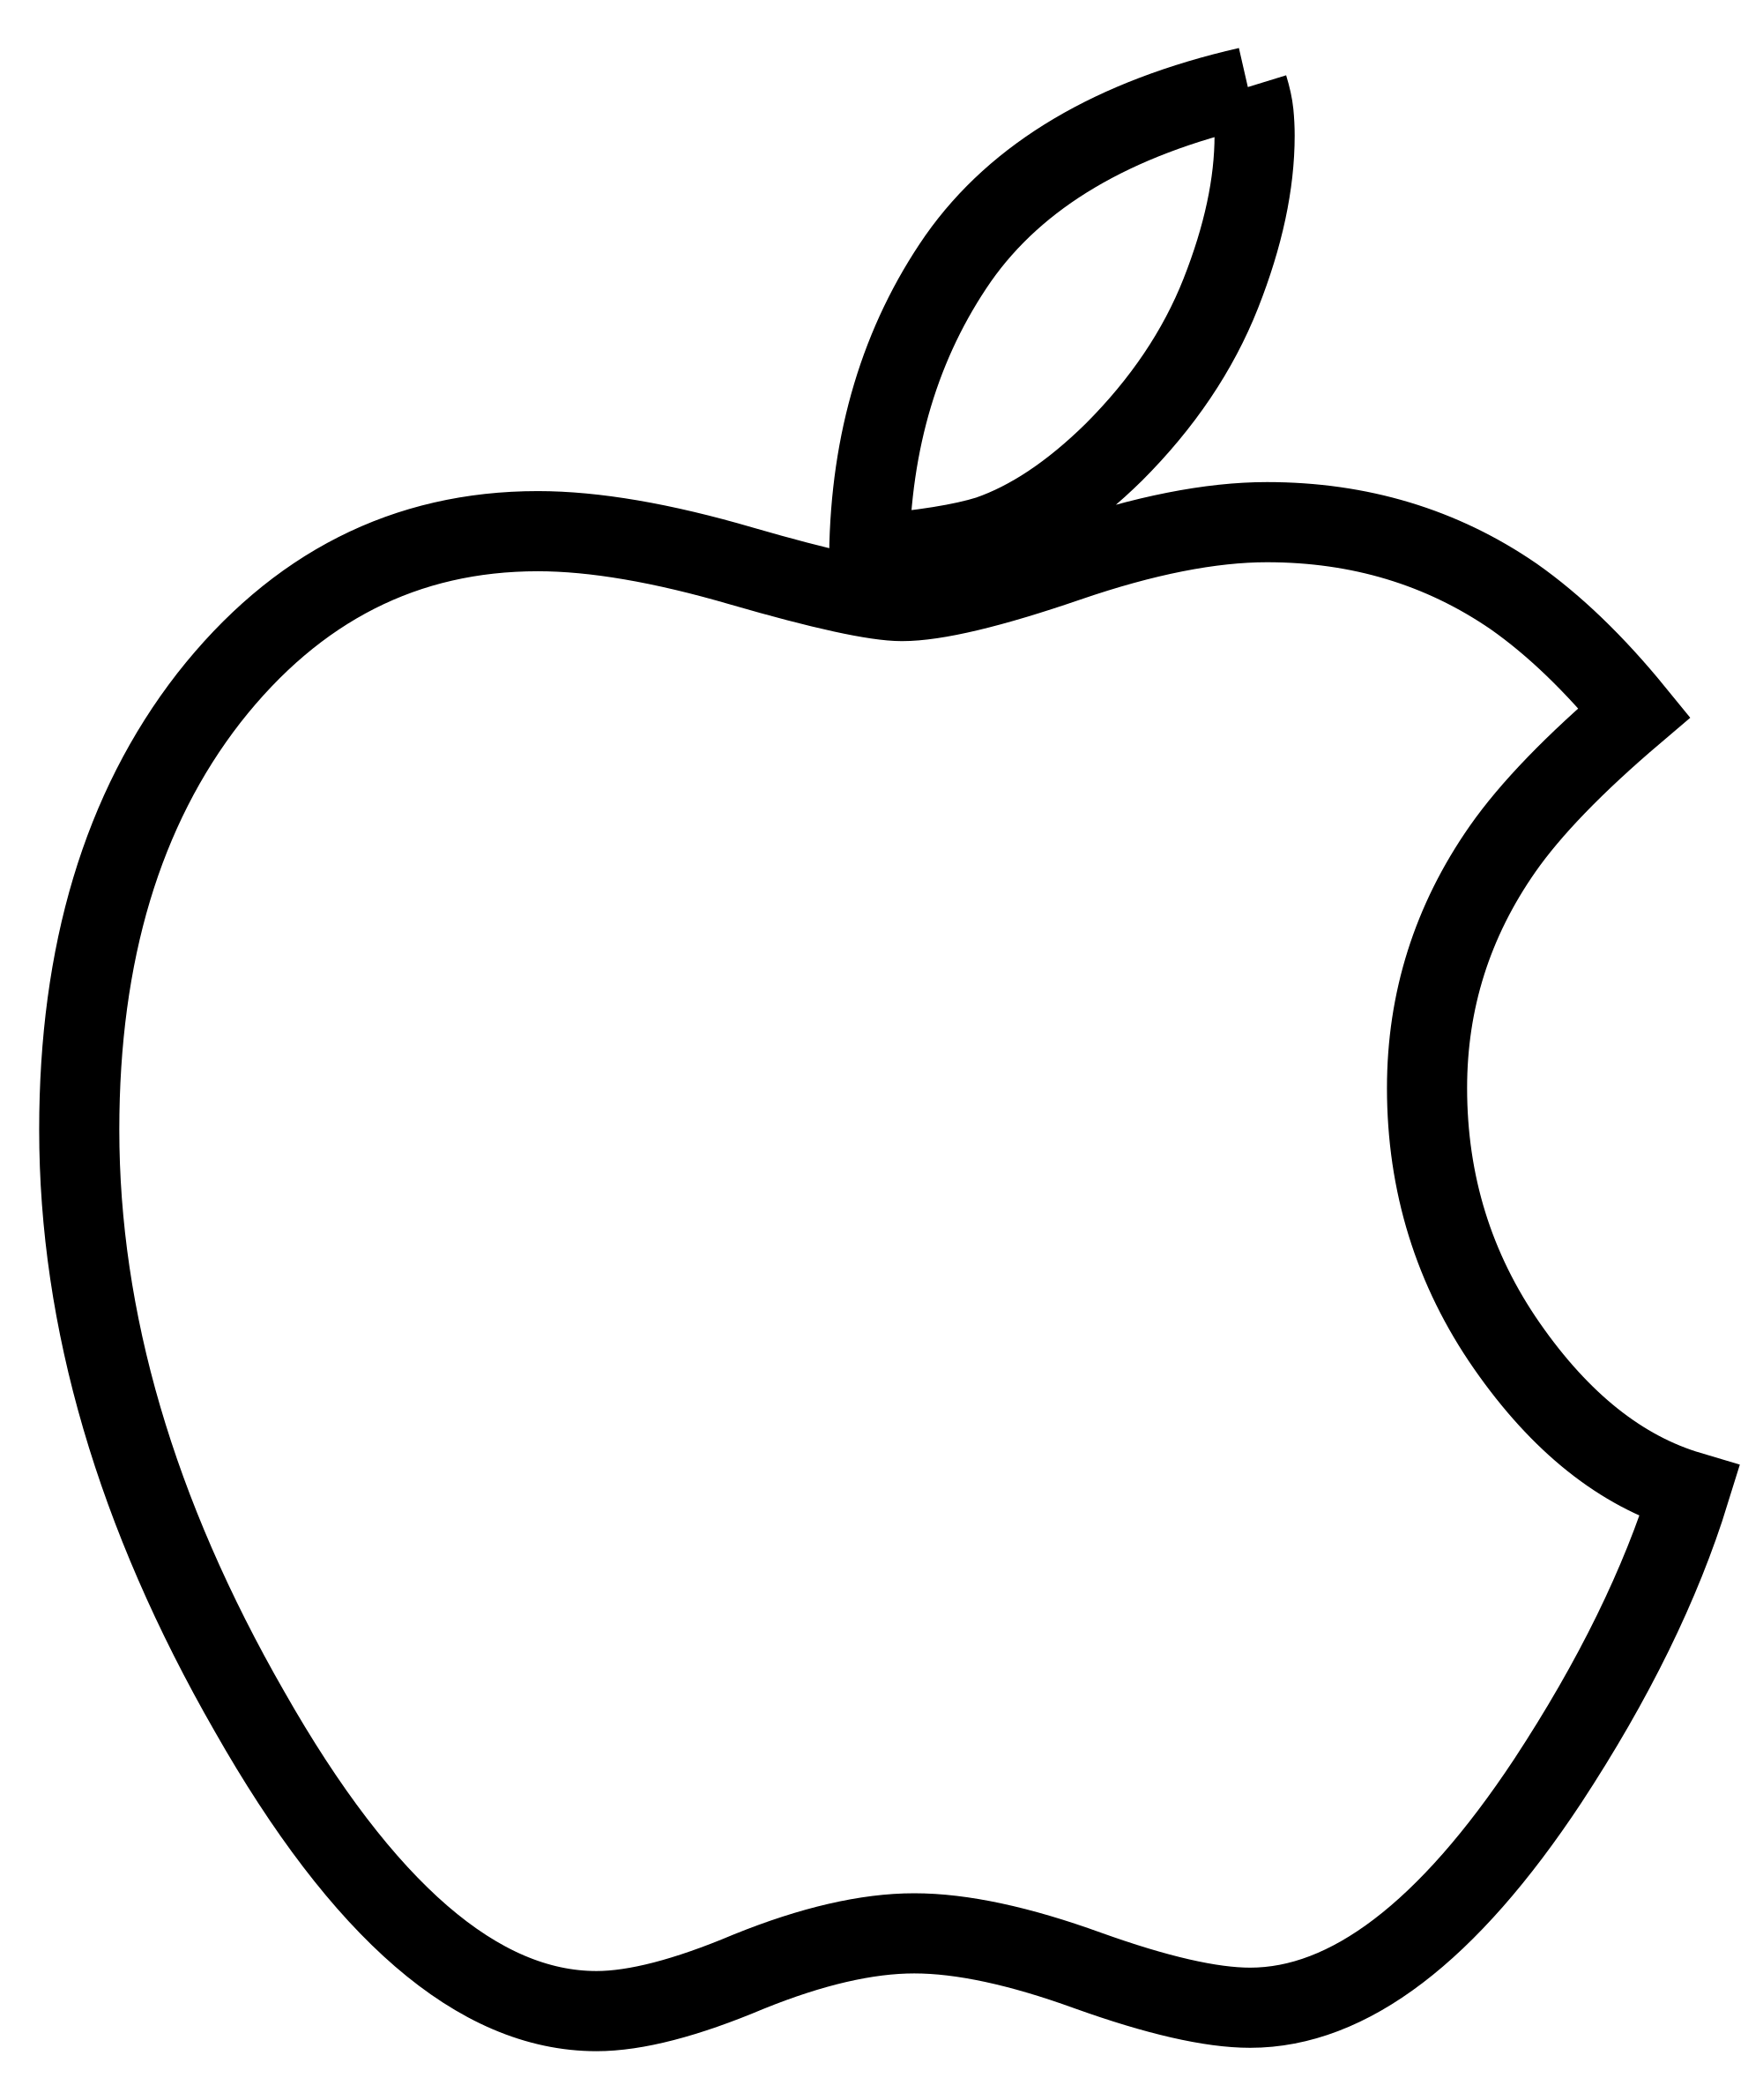 2000x2382 Fileapple Logo Hollow.svg